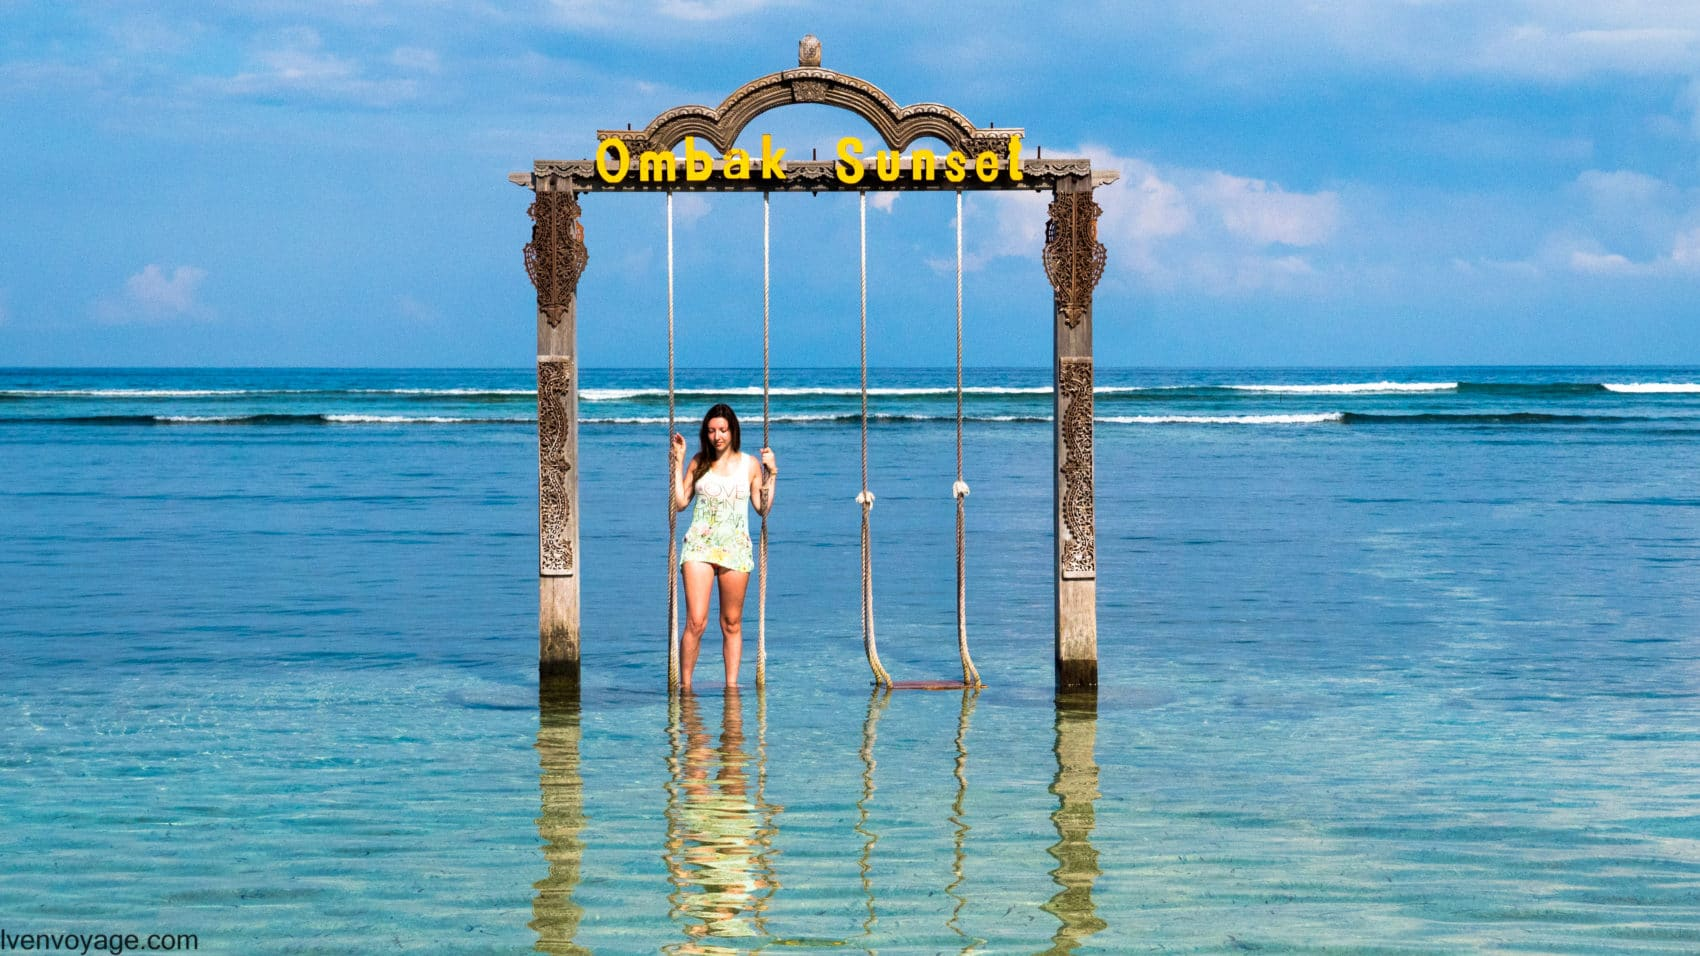 Balançoire dans l'eau OMBAK SUNSET GILI TRAWANGAN INDONESIE